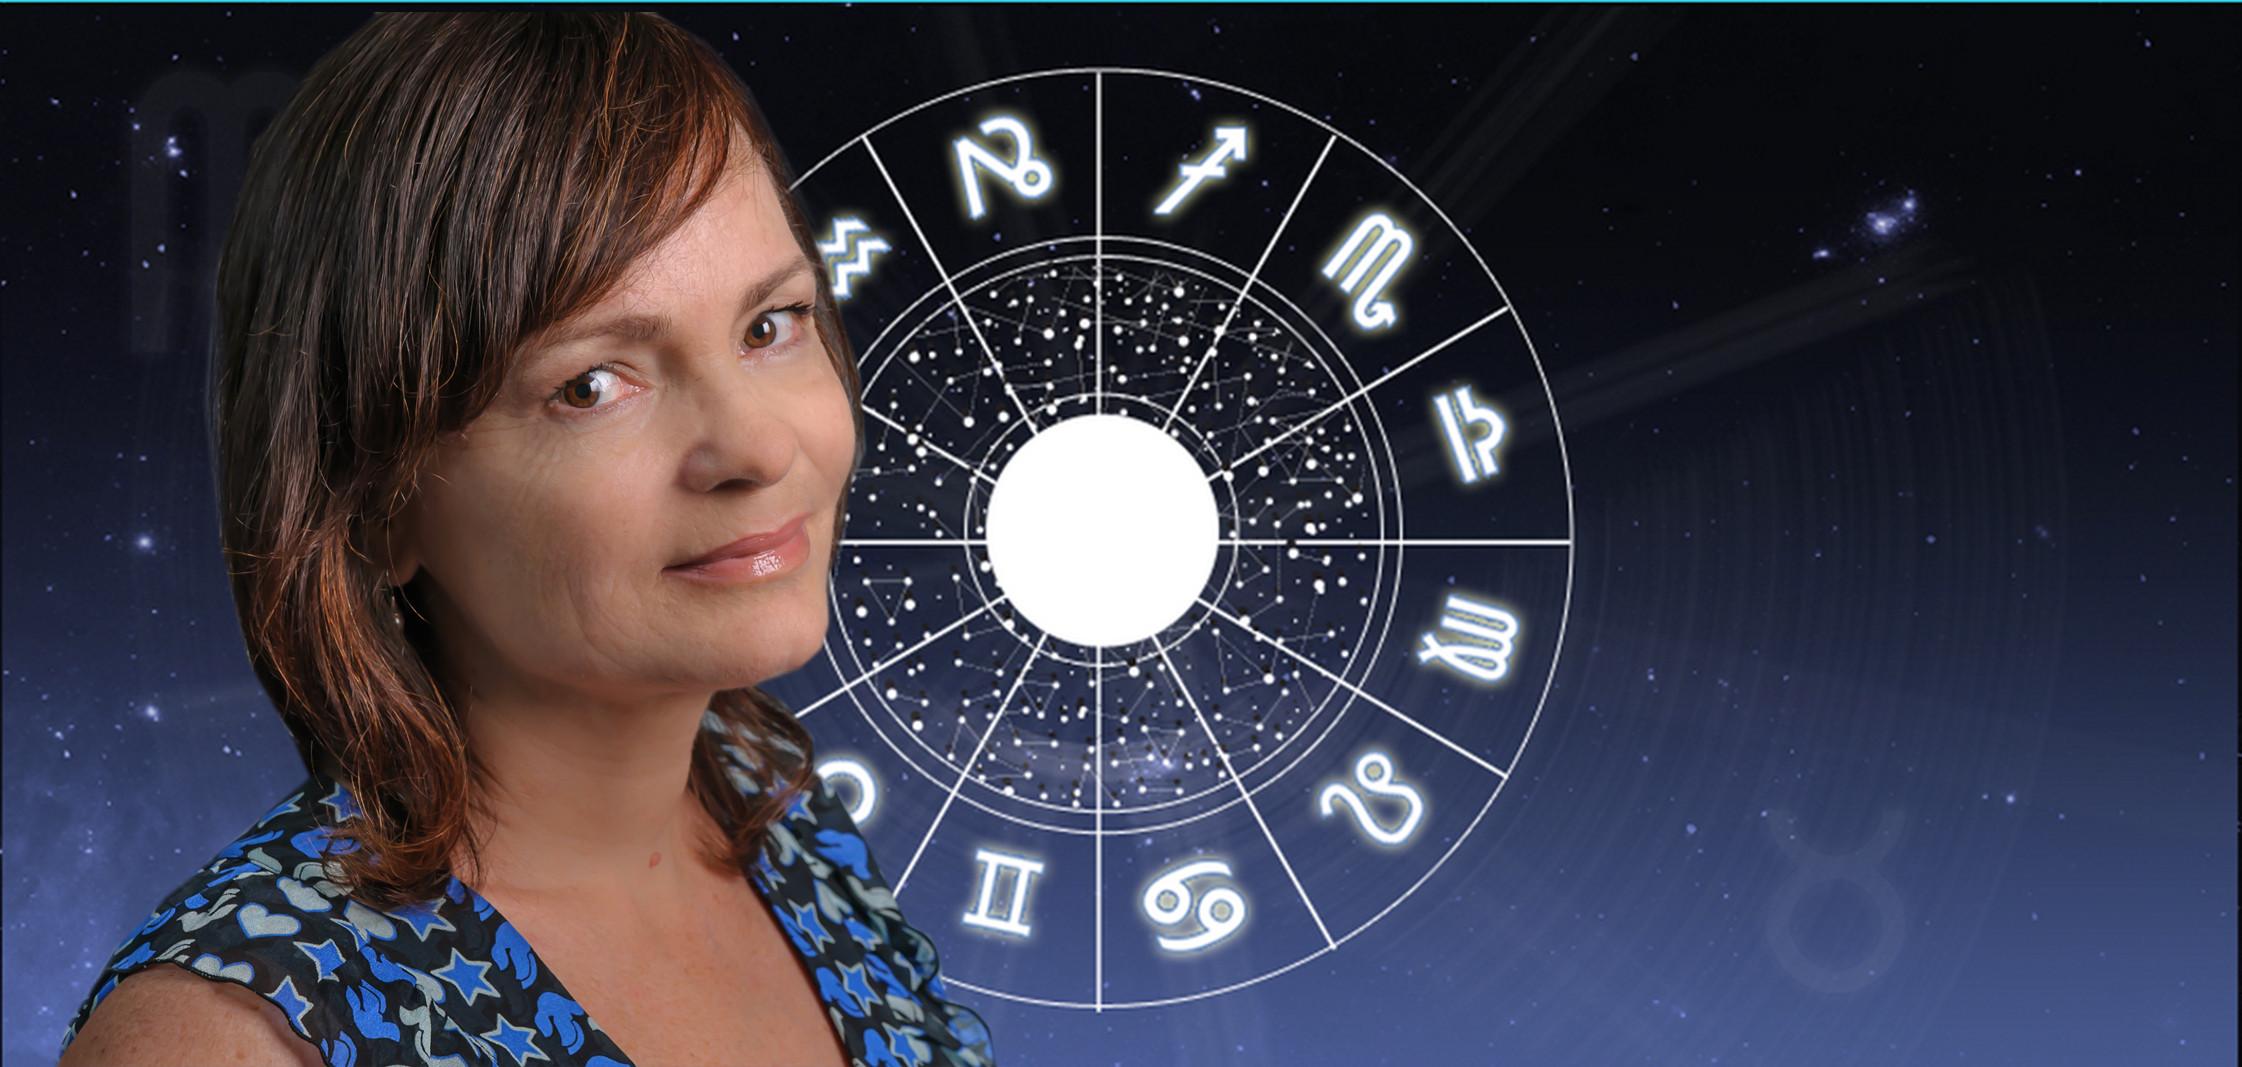 Astrology analysis & report